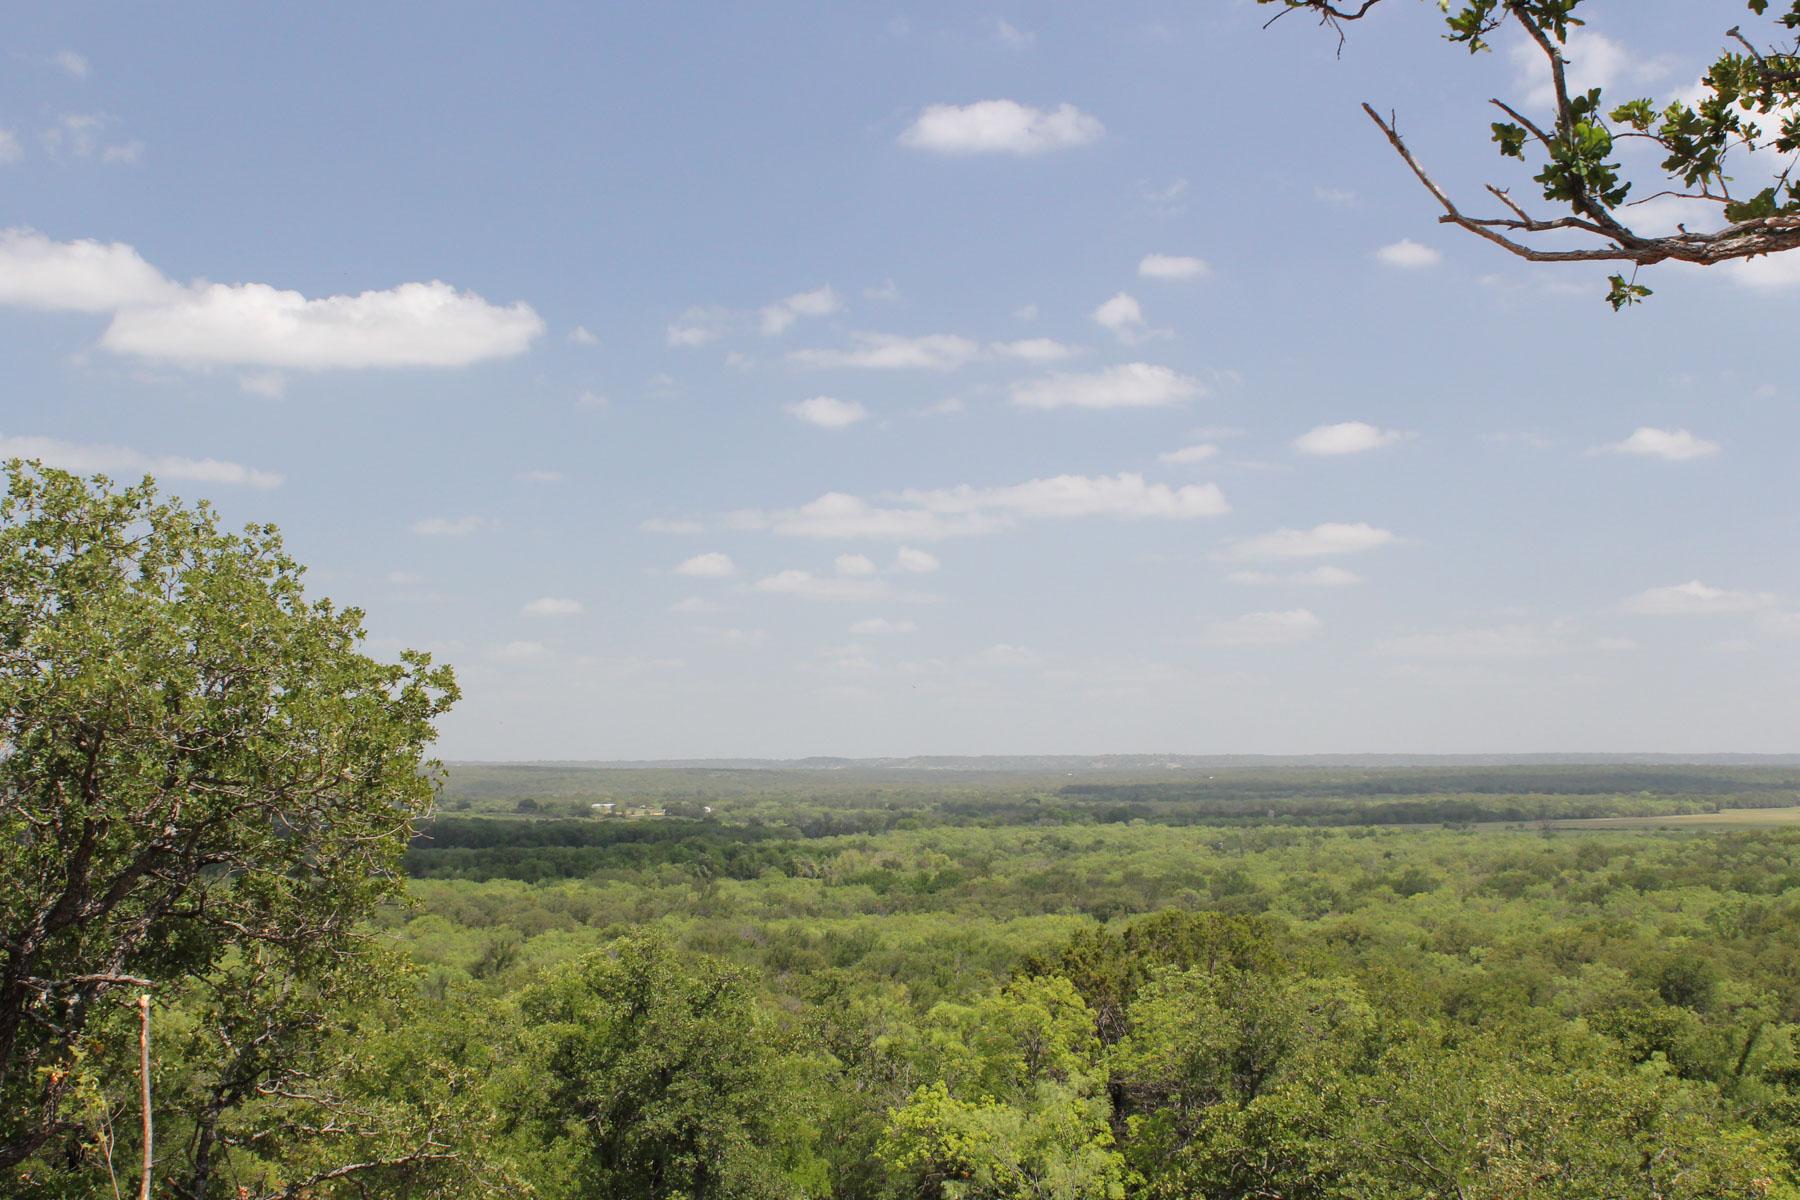 Đất đai vì Bán tại 15378 Co Rd 136 Parcel 4, Gordon Gordon, Texas, 76453 Hoa Kỳ